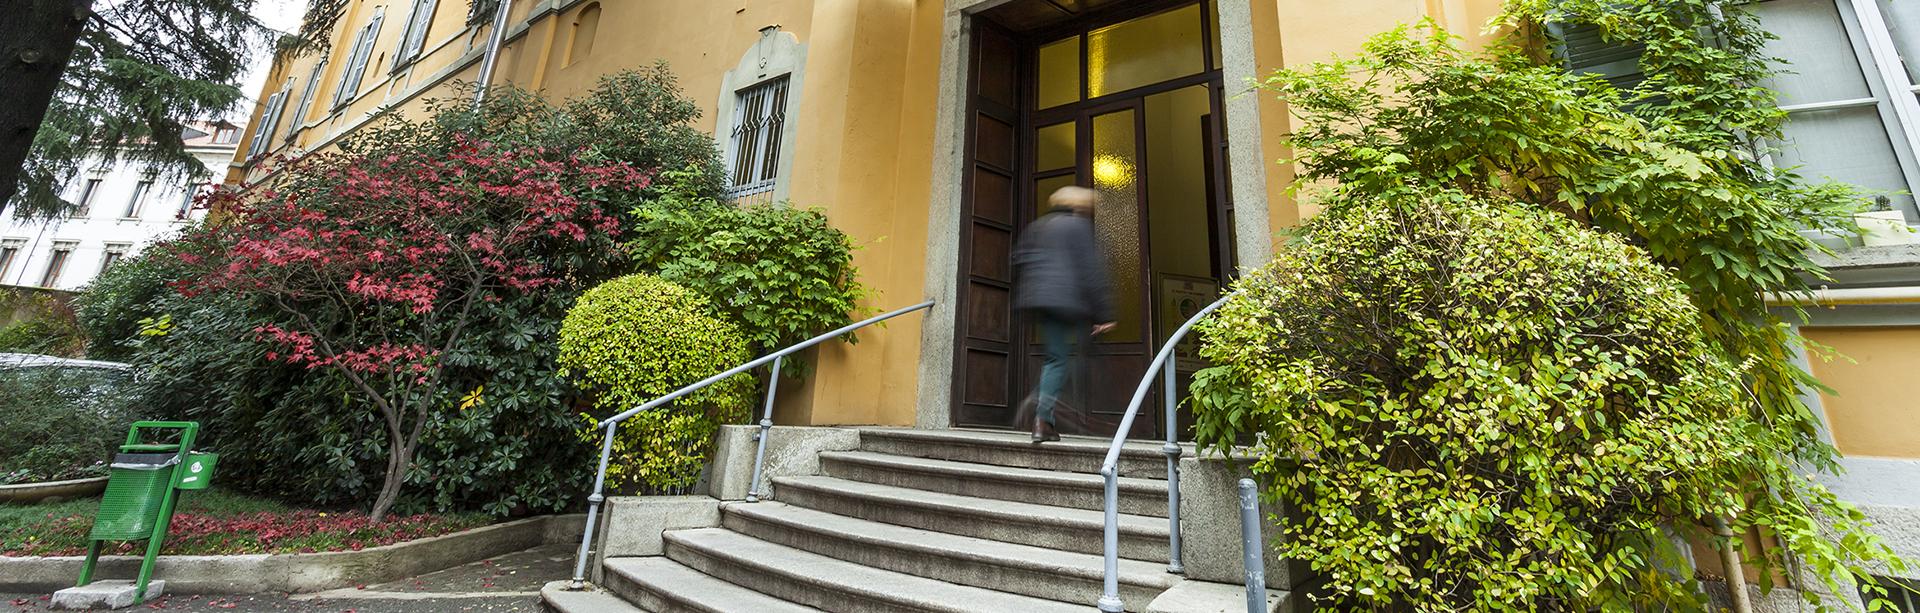 Cose Di Casa Carate istituti clinici zucchi brugherio | gruppo san donato